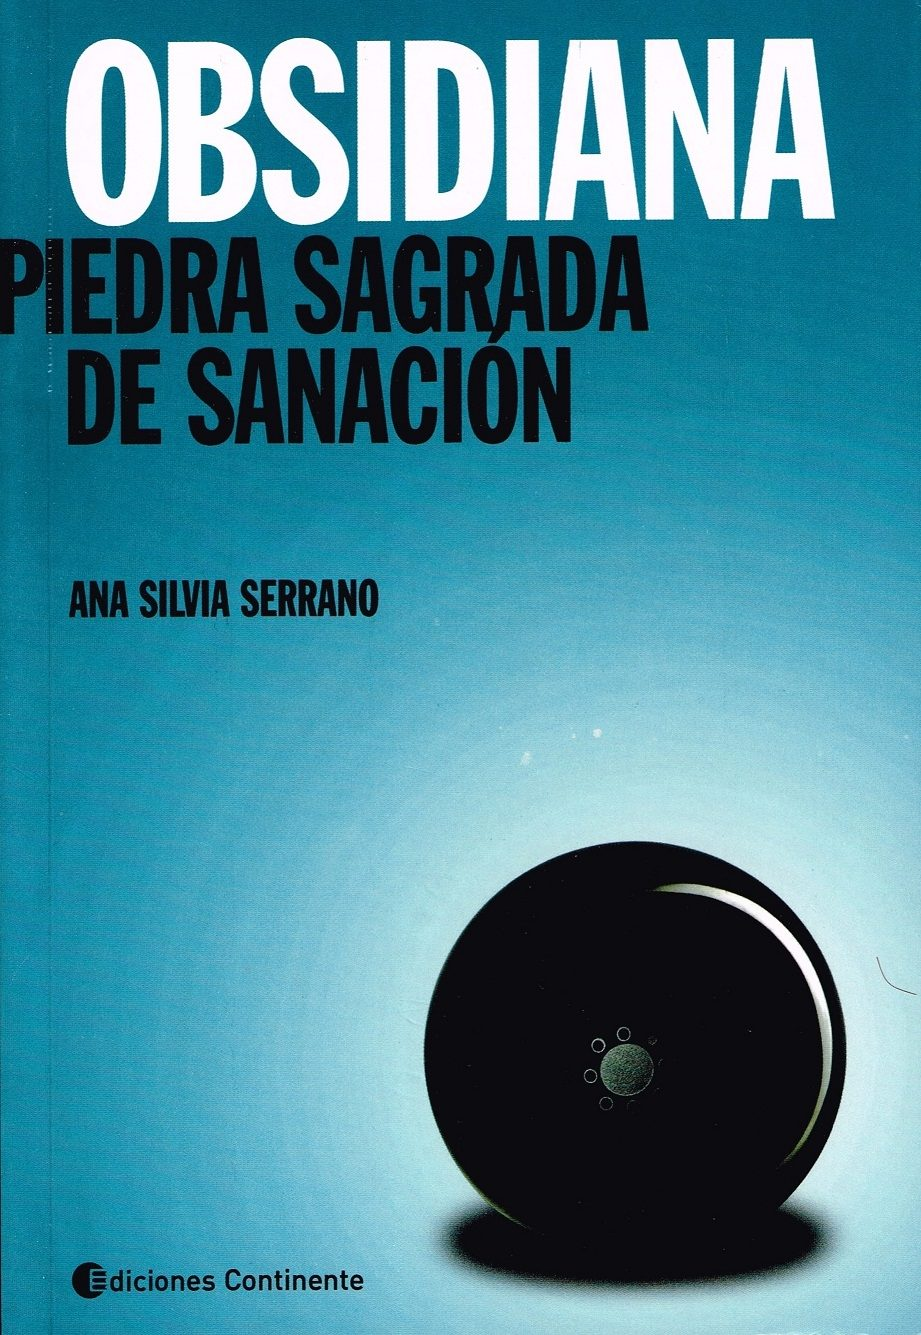 Obsidiana Piedra Sagrada De Sanacion Ana Silvia Serrano Comprar